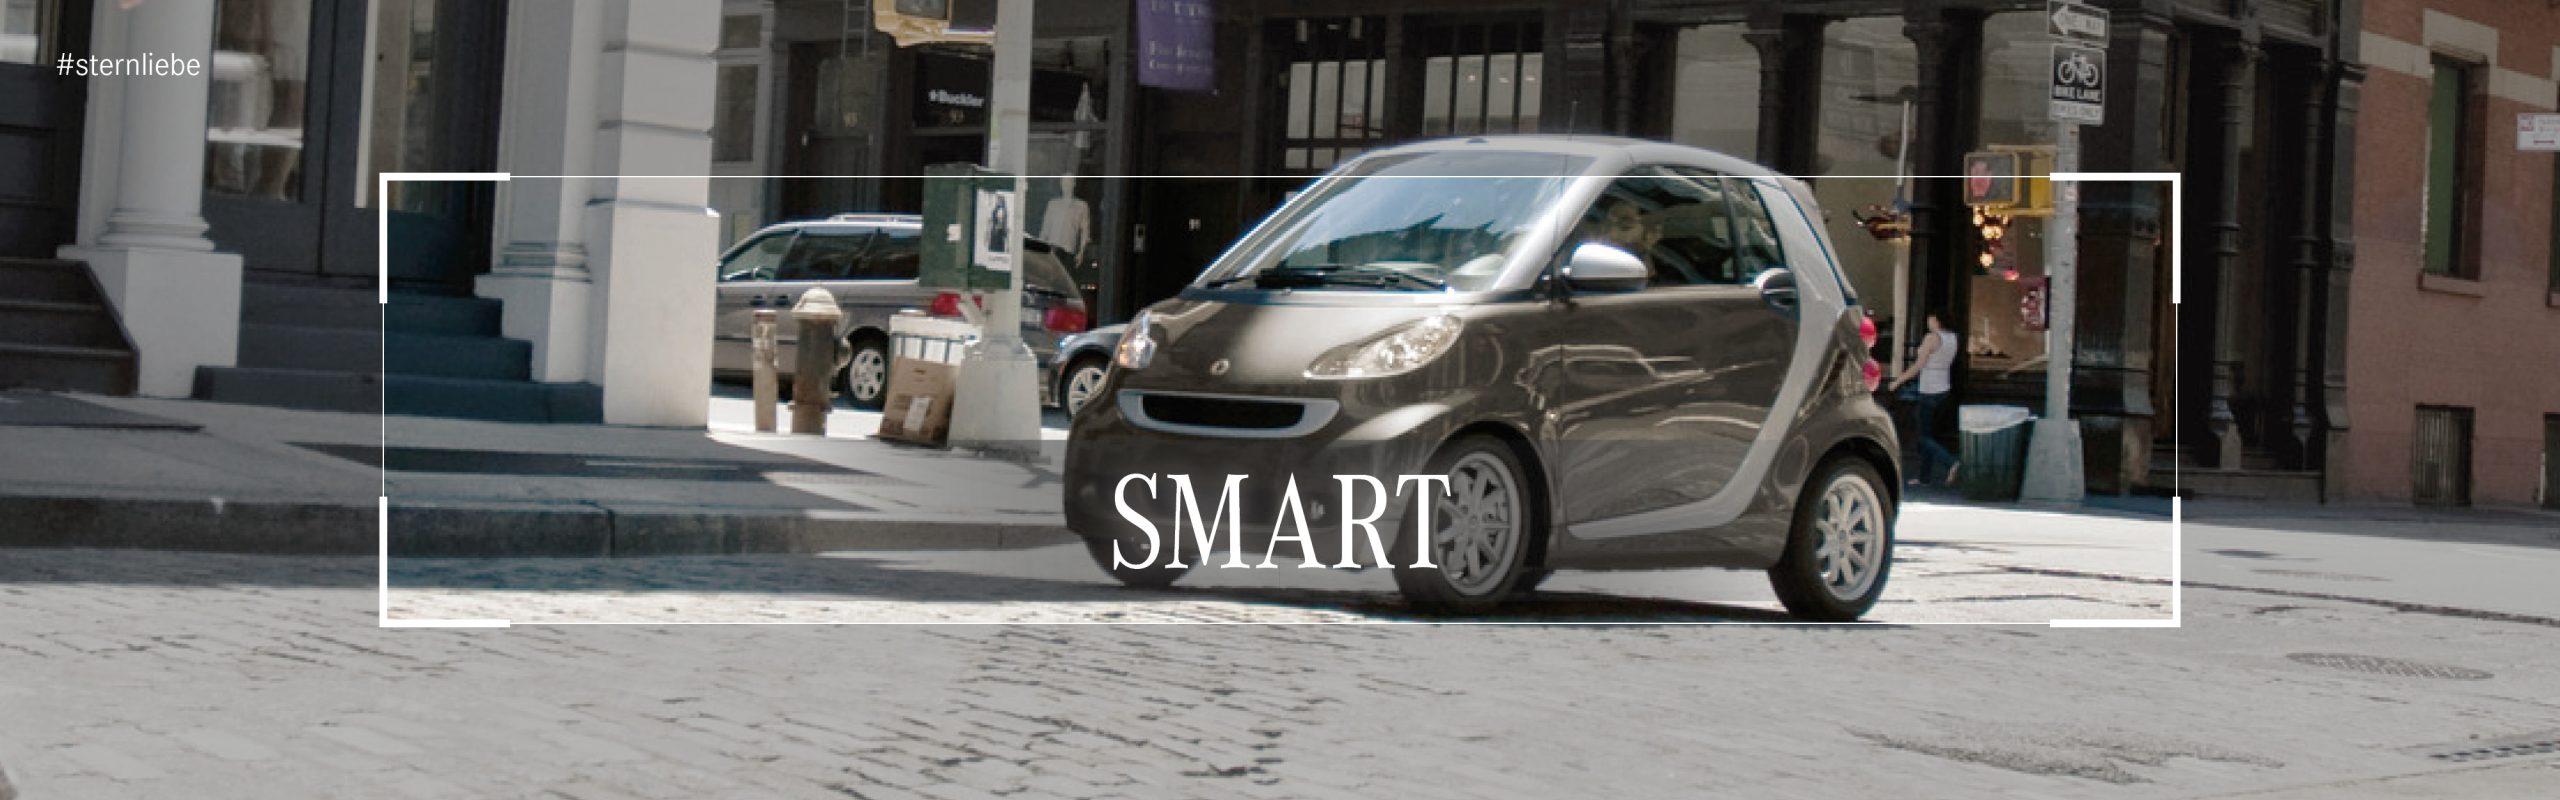 Banner-smart_fortwo-foufour-elektro-beimercedes brinkmann